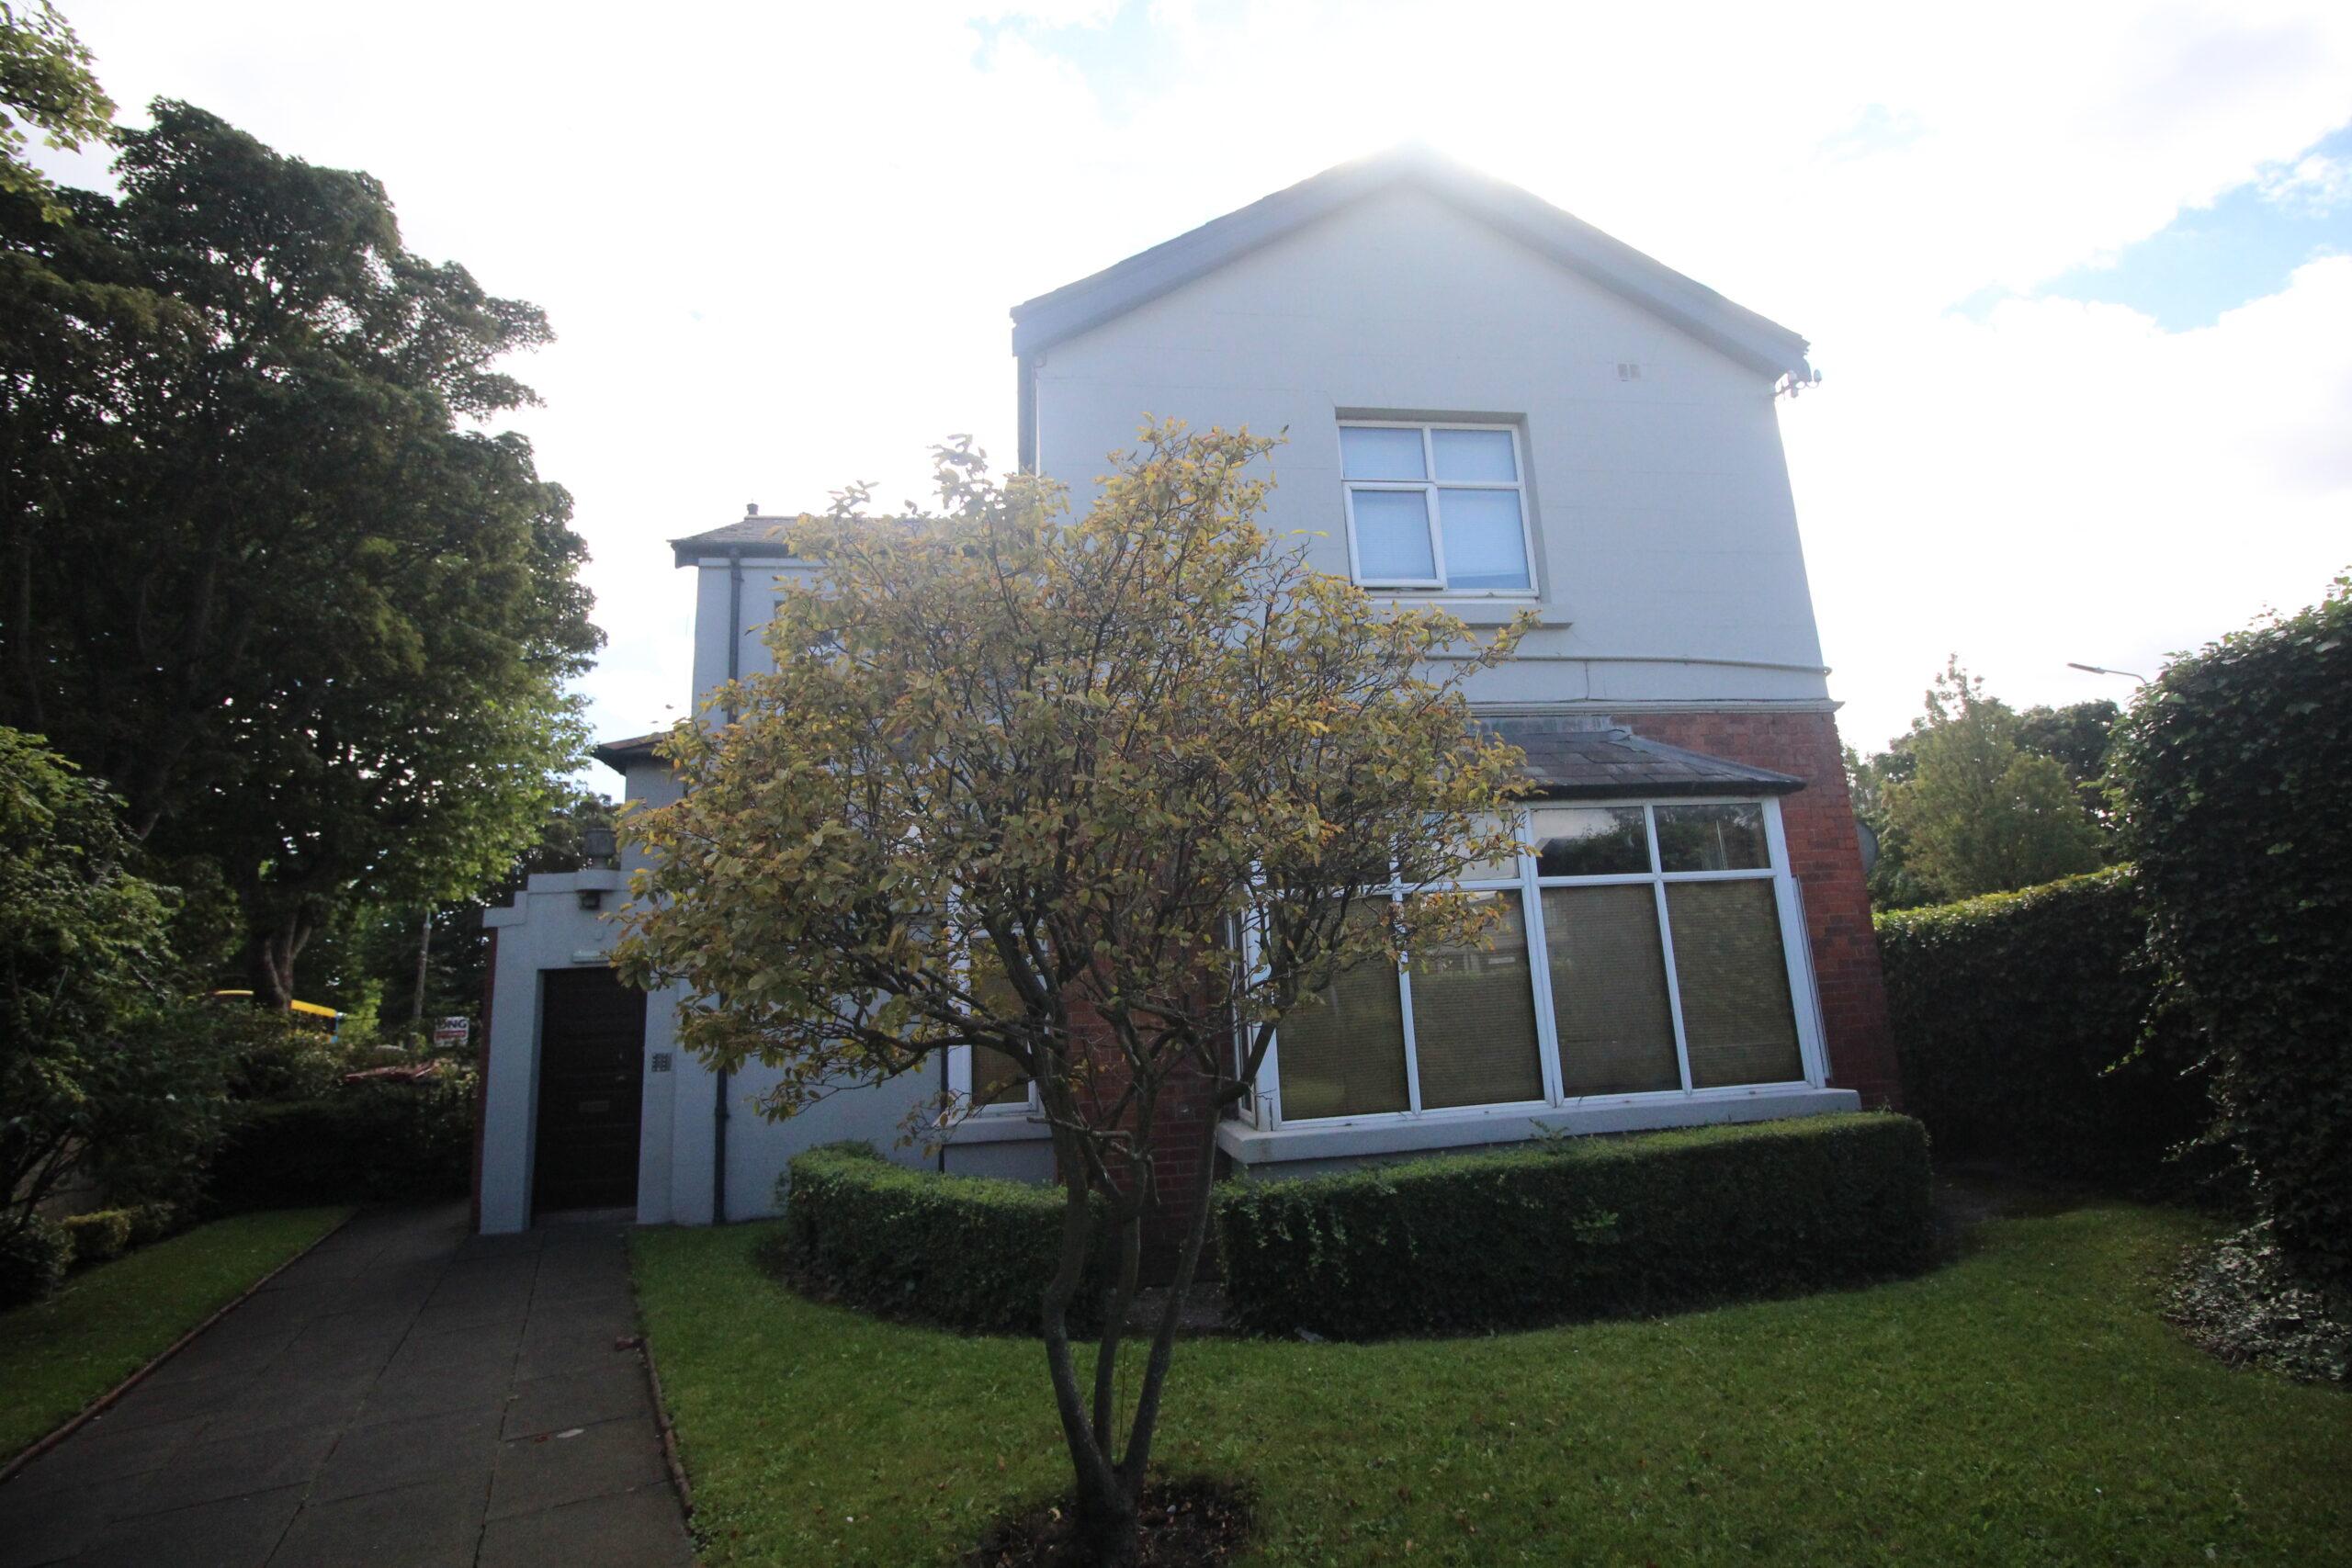 Studio, Cabra Road, Dublin 7